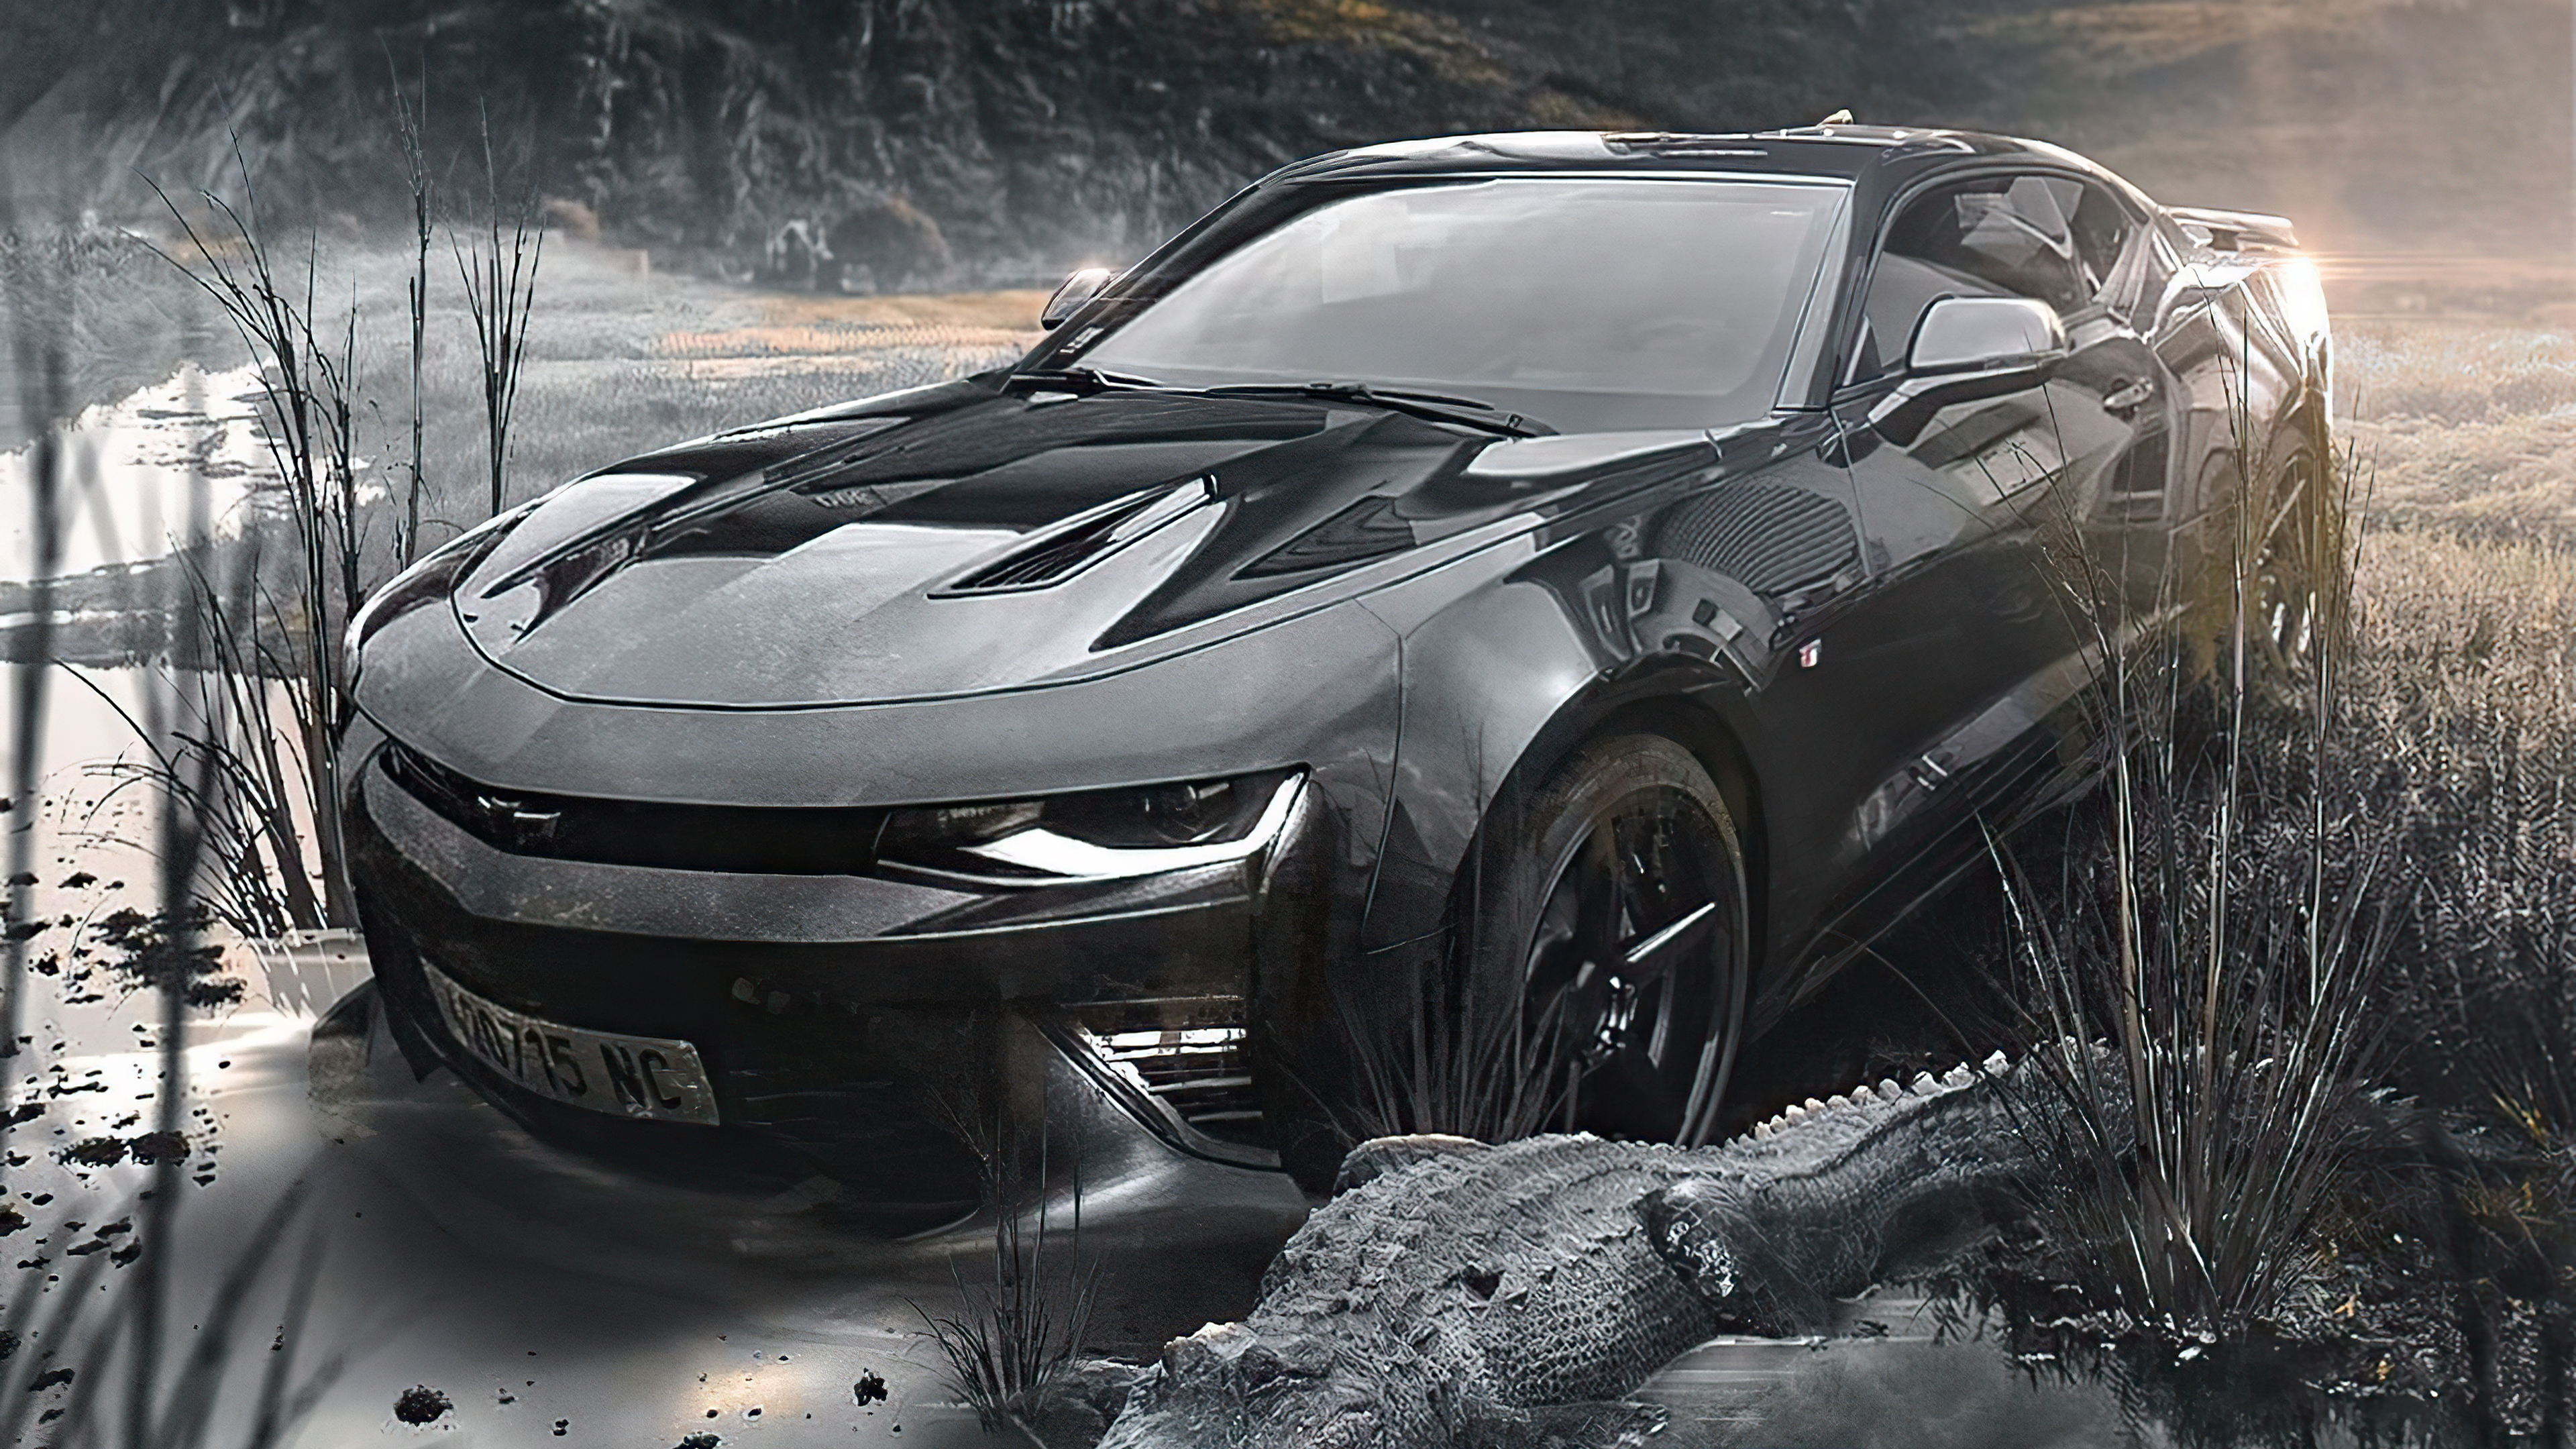 chevy camaro black 4k 1618922102 - Chevy Camaro Black 4k - Chevy Camaro Black 4k wallpapers